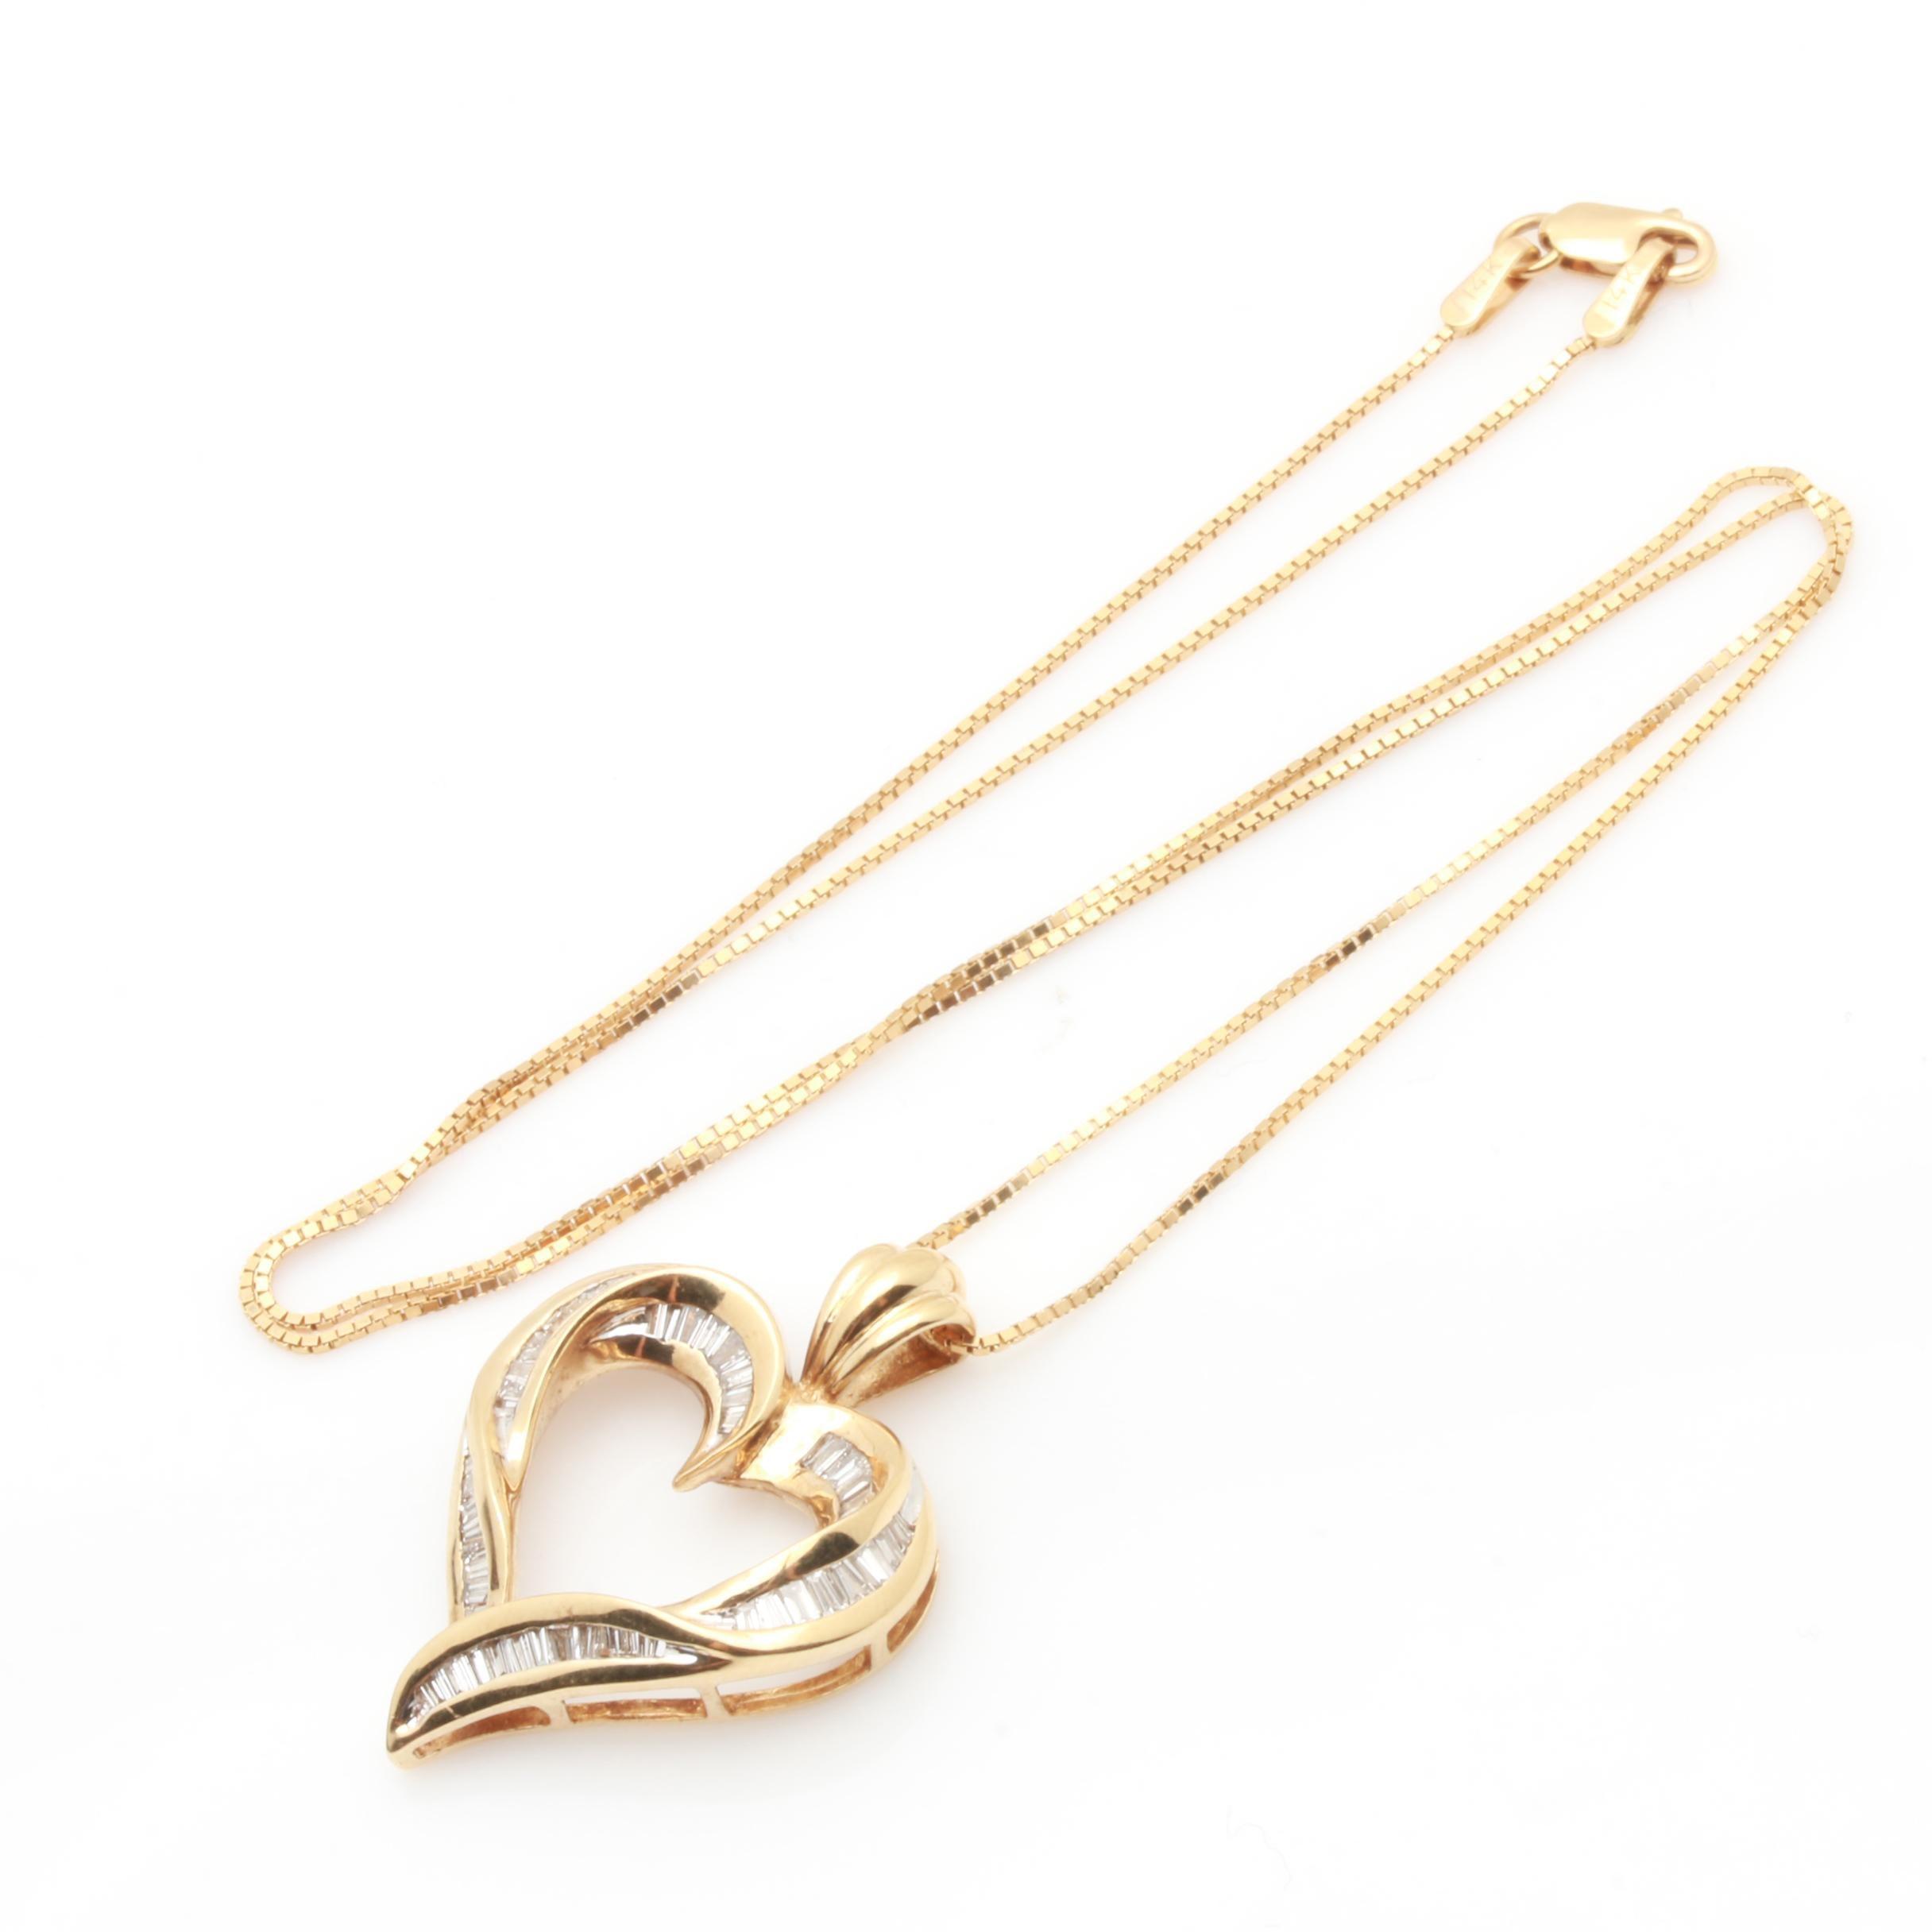 14K Yellow Gold Diamond Openwork Heart Pendant Necklace